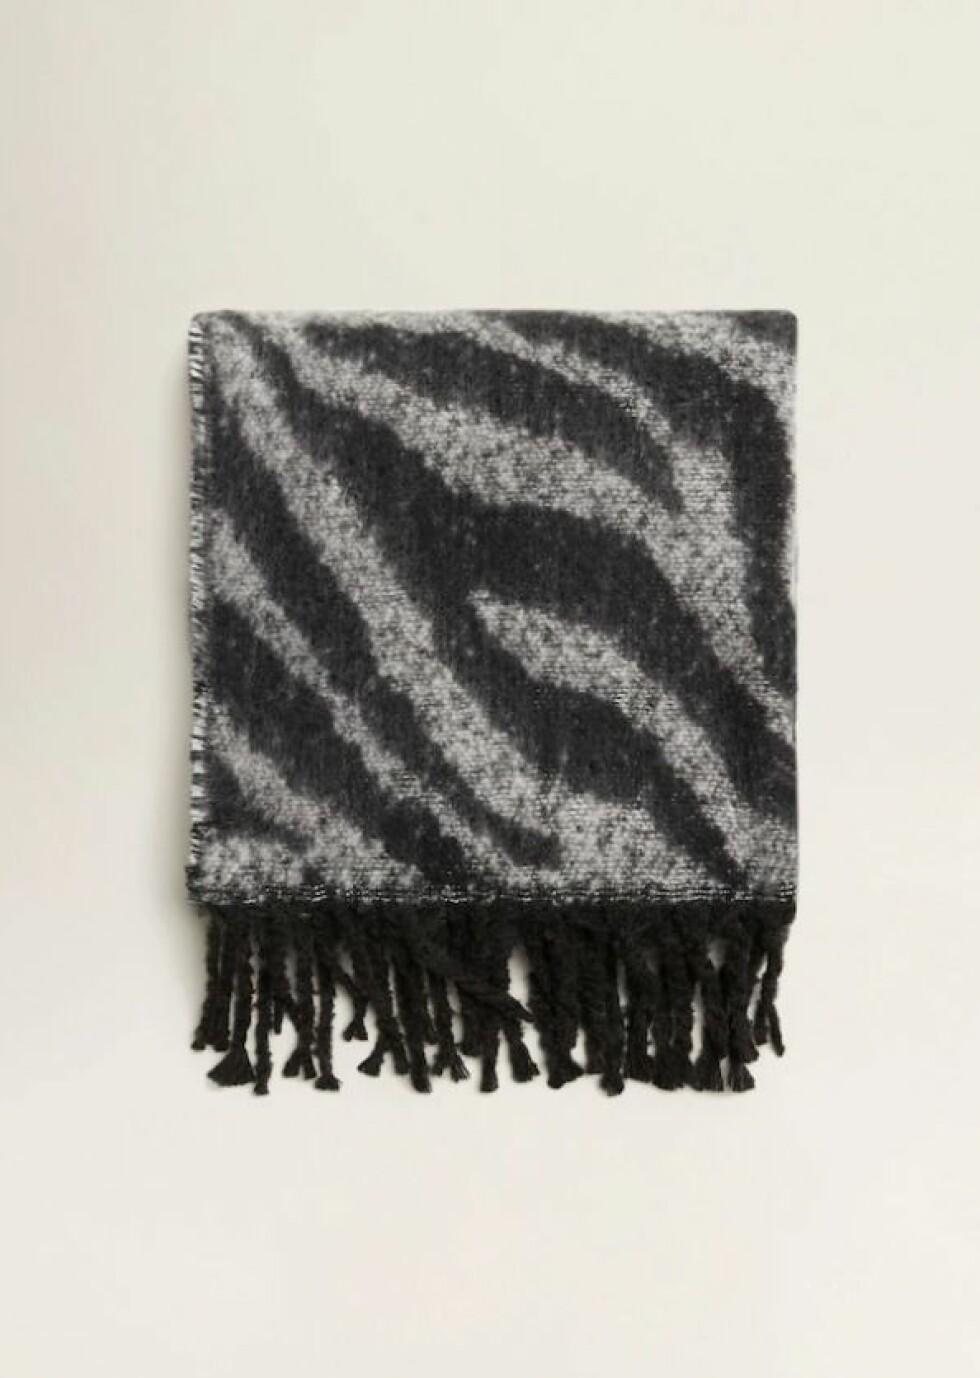 Skjerf fra Mango |299,-| https://shop.mango.com/no-en/women/scarves-and-foulards/zebra-printed-scarf_33045780.html?c=99&n=1&s=accesorios_she.accesorio;52,452